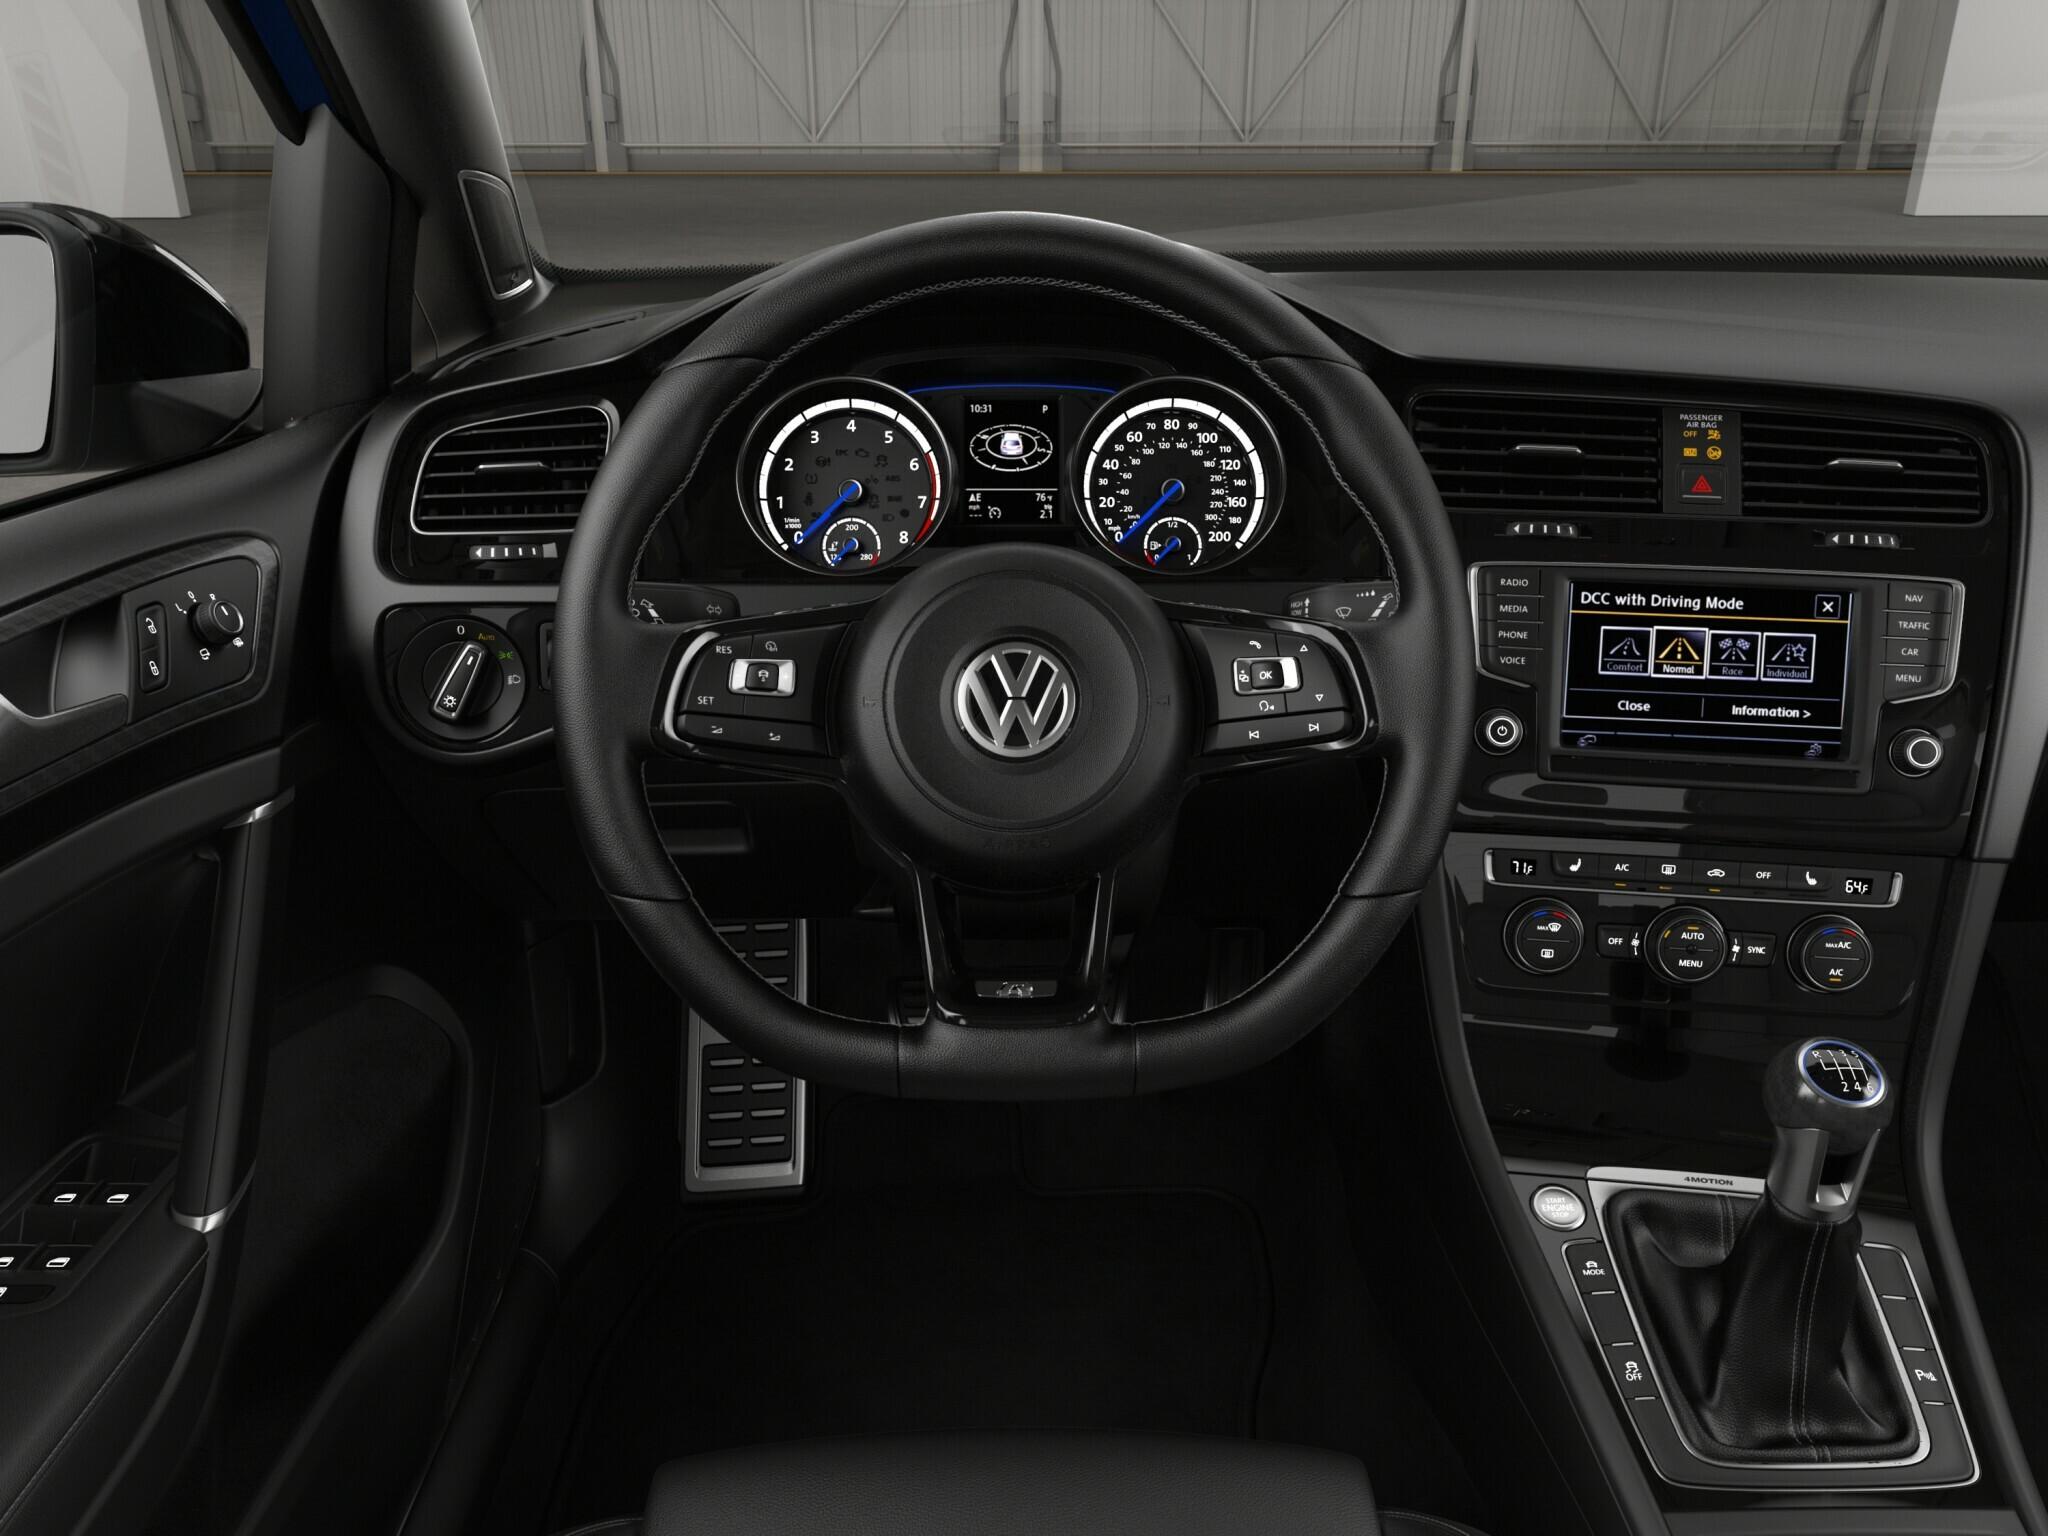 2017 Vw Golf R W Dcc Nav Dap Volkswagen Motor Satria 120 Driver Console